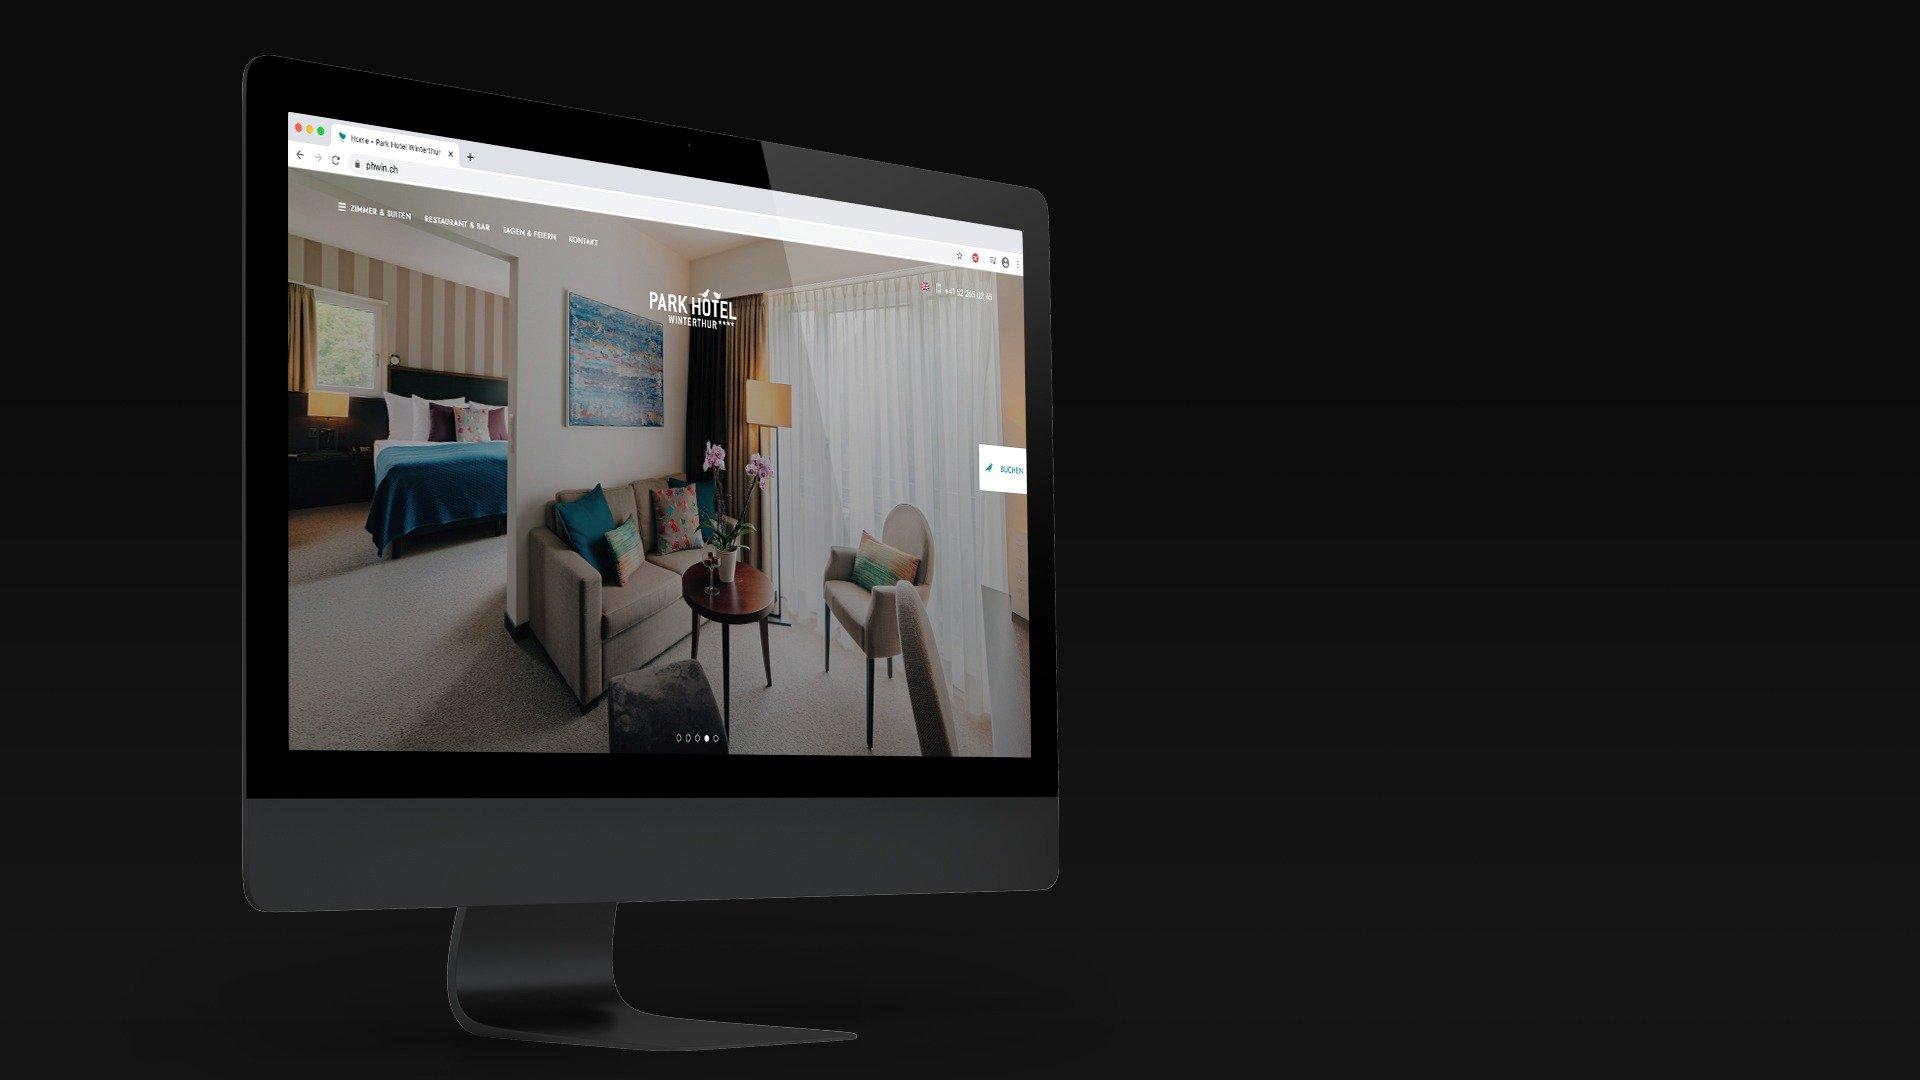 Park Hotel Winterthur Webdesign Surface Responsive 2 Tyro Media Group